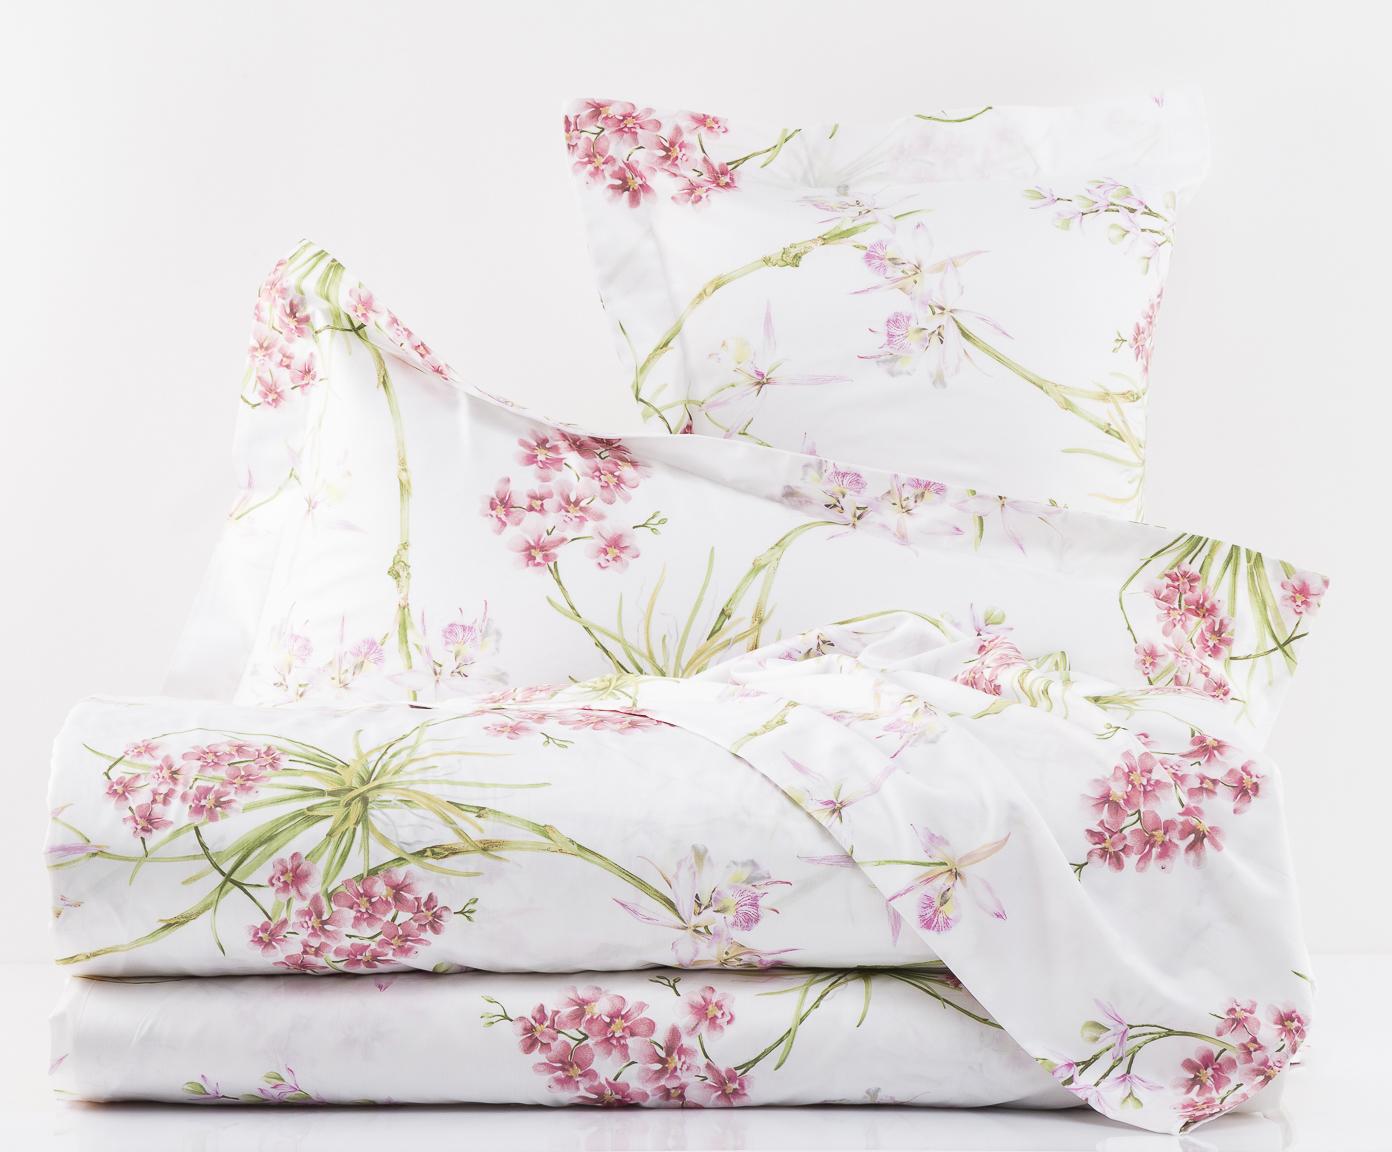 Постельное Постельное белье семейное Mirabello Orchidee розовое komplekt-postelnogo-belya-orchidee-ot-mirabello-italiya.jpg